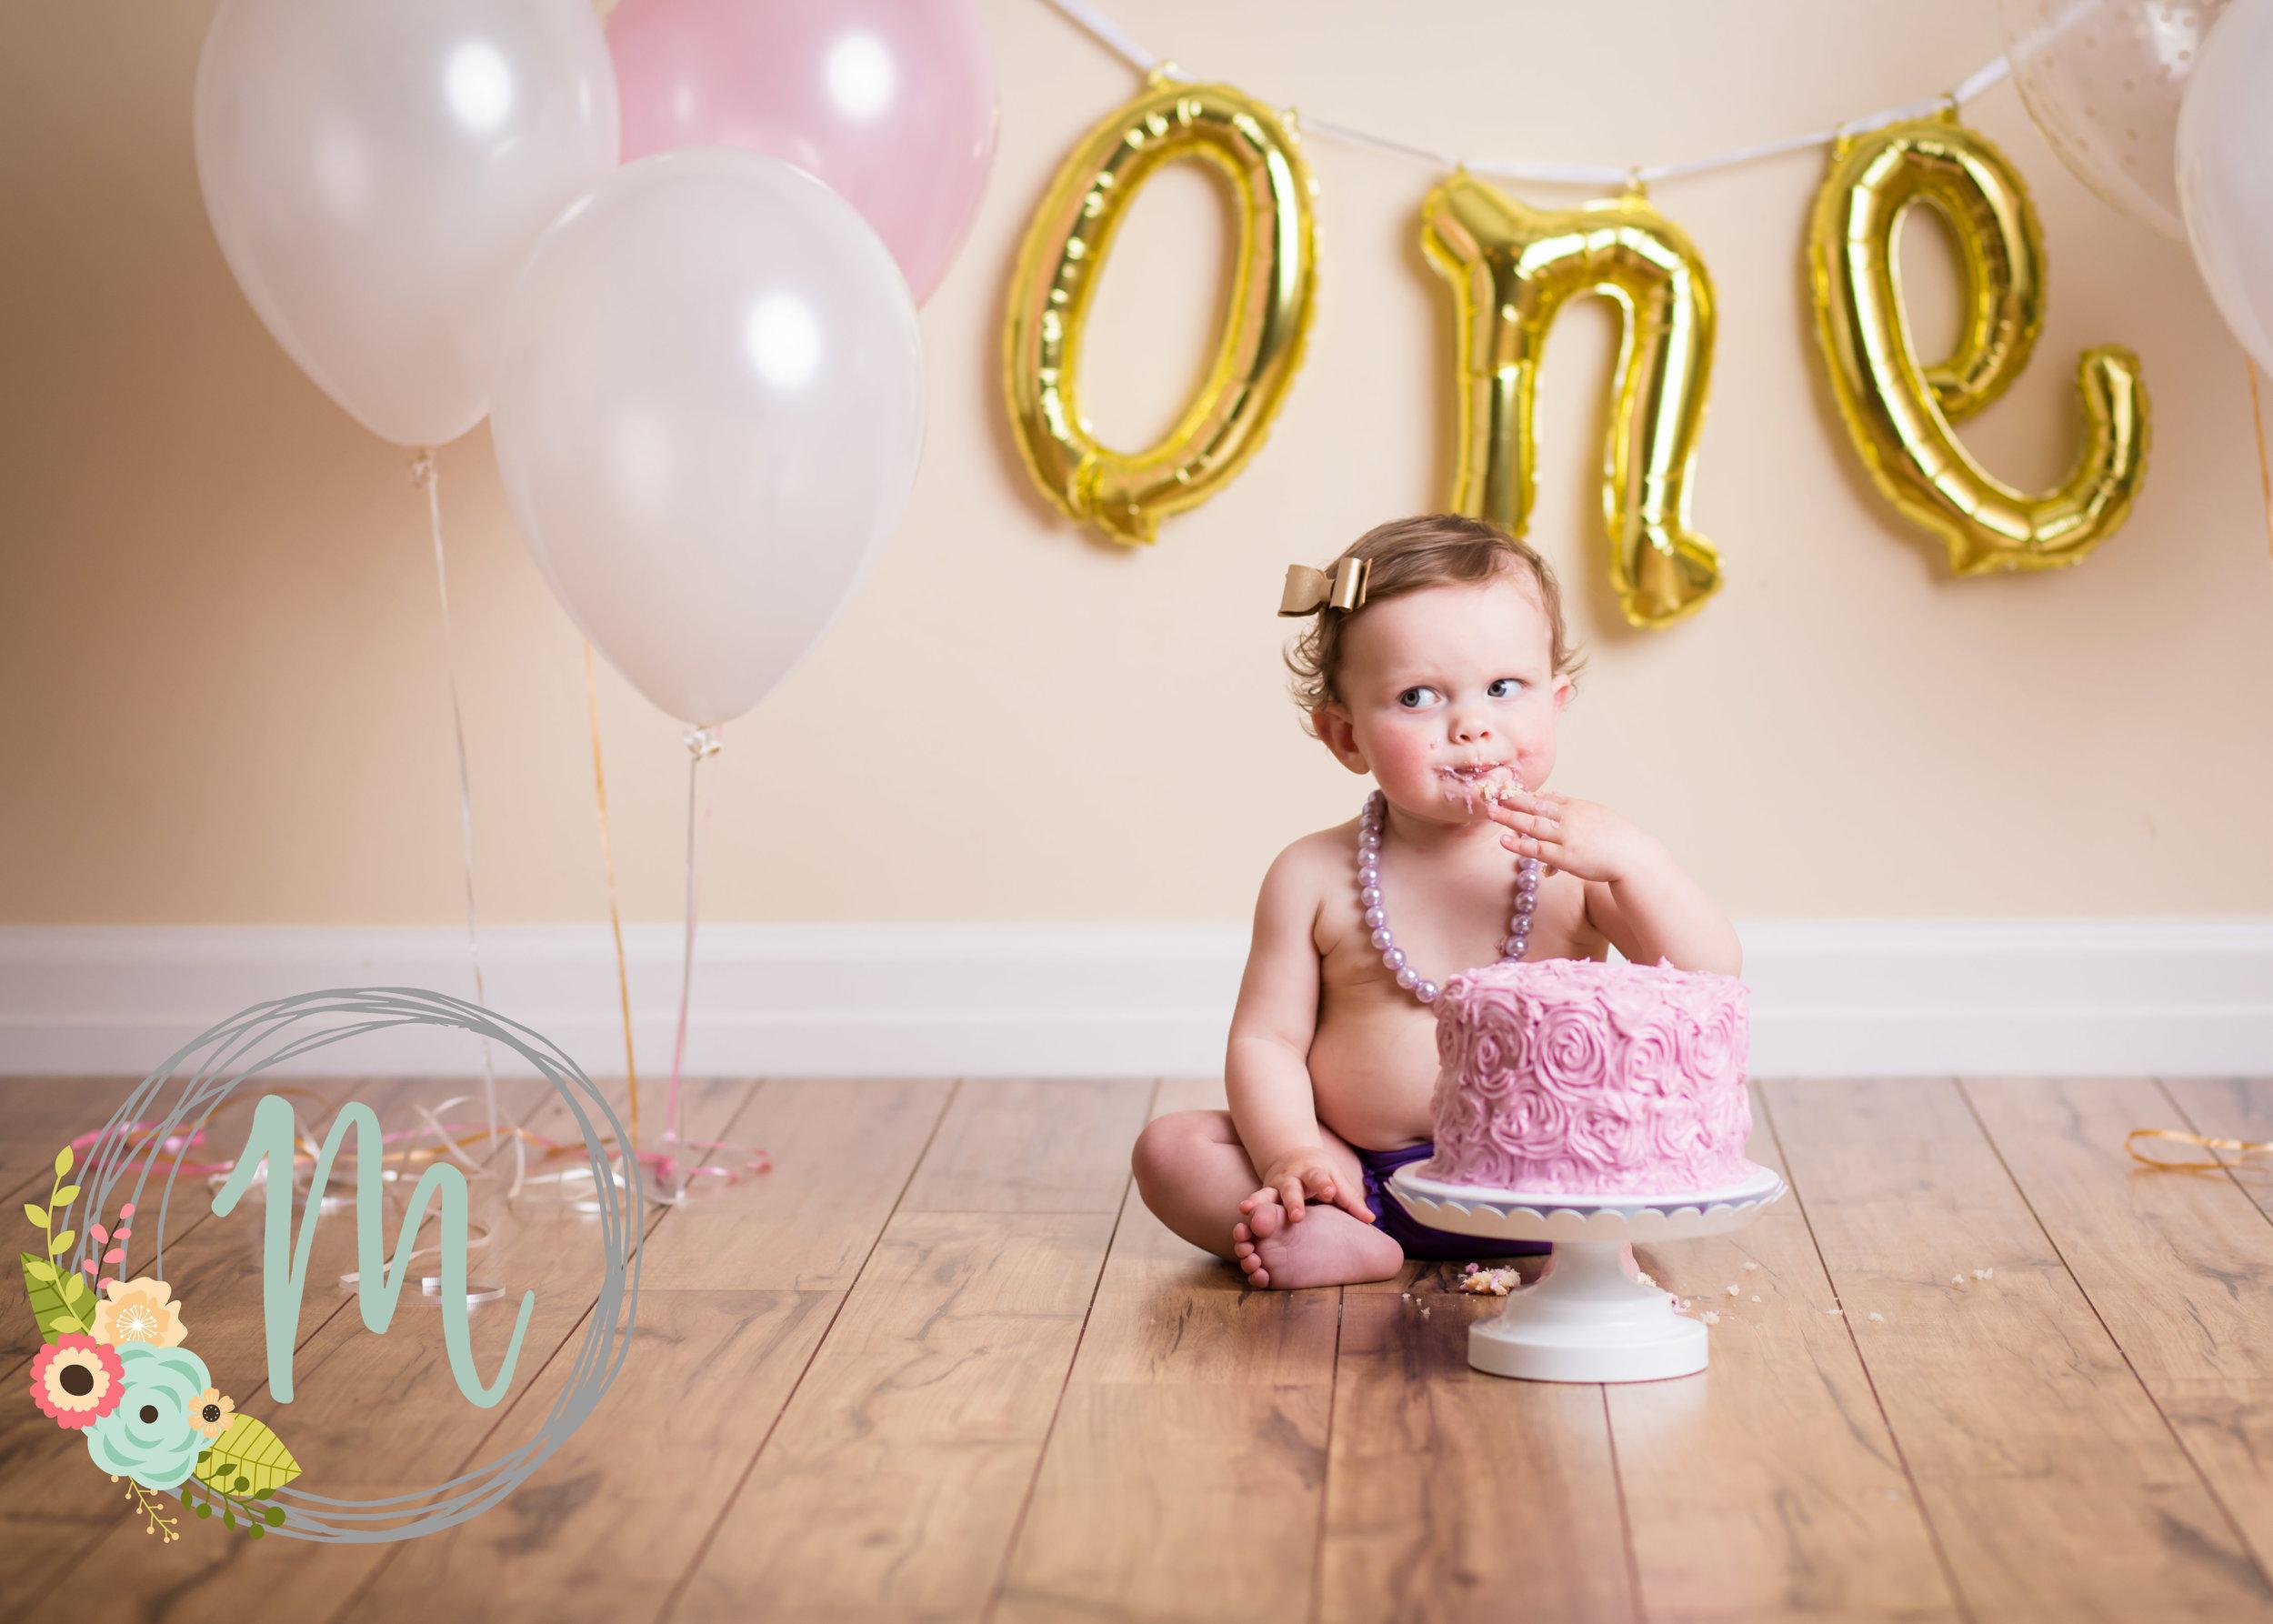 Mobie Photo - Utah Newborn Photography - First birthday pictures.